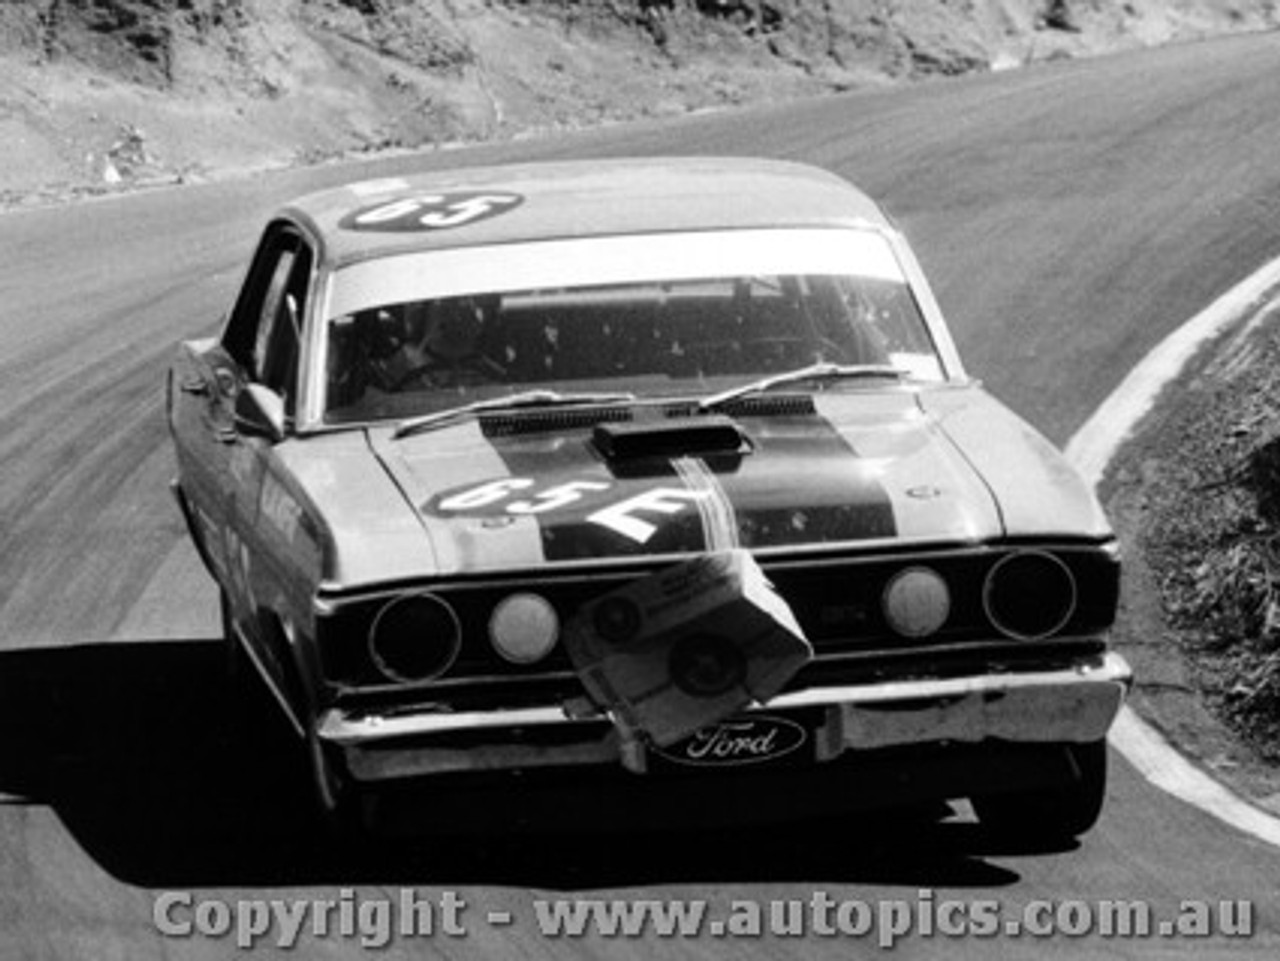 71703  -  Allan Moffat  -  Bathurst 1971 -1st Outright & Class E winner - Ford Falcon GTHO Phase 3